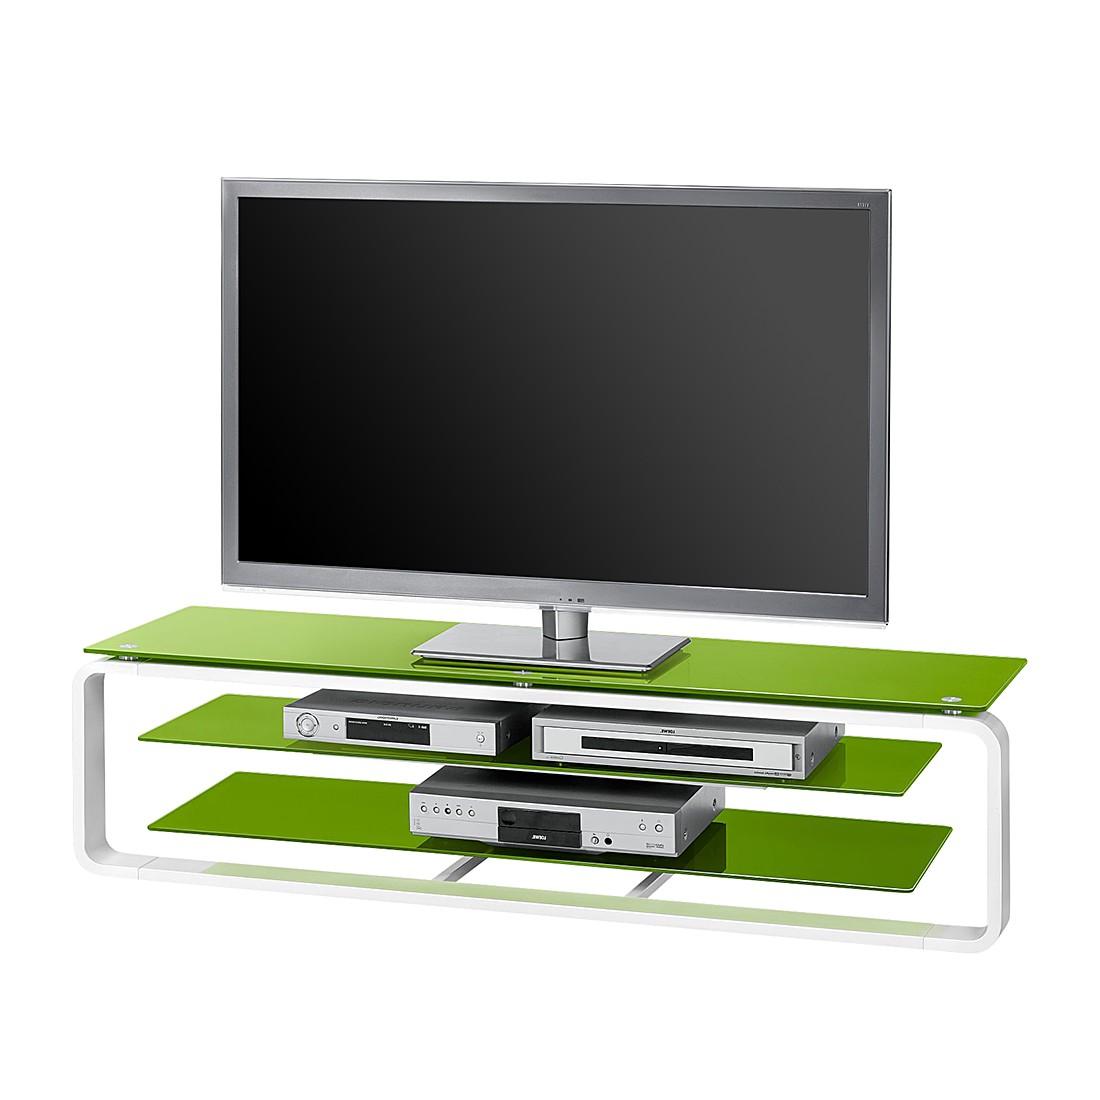 Home 24 - Meuble tv rack jared i - blanc / verre vert - 150 cm, maja möbel